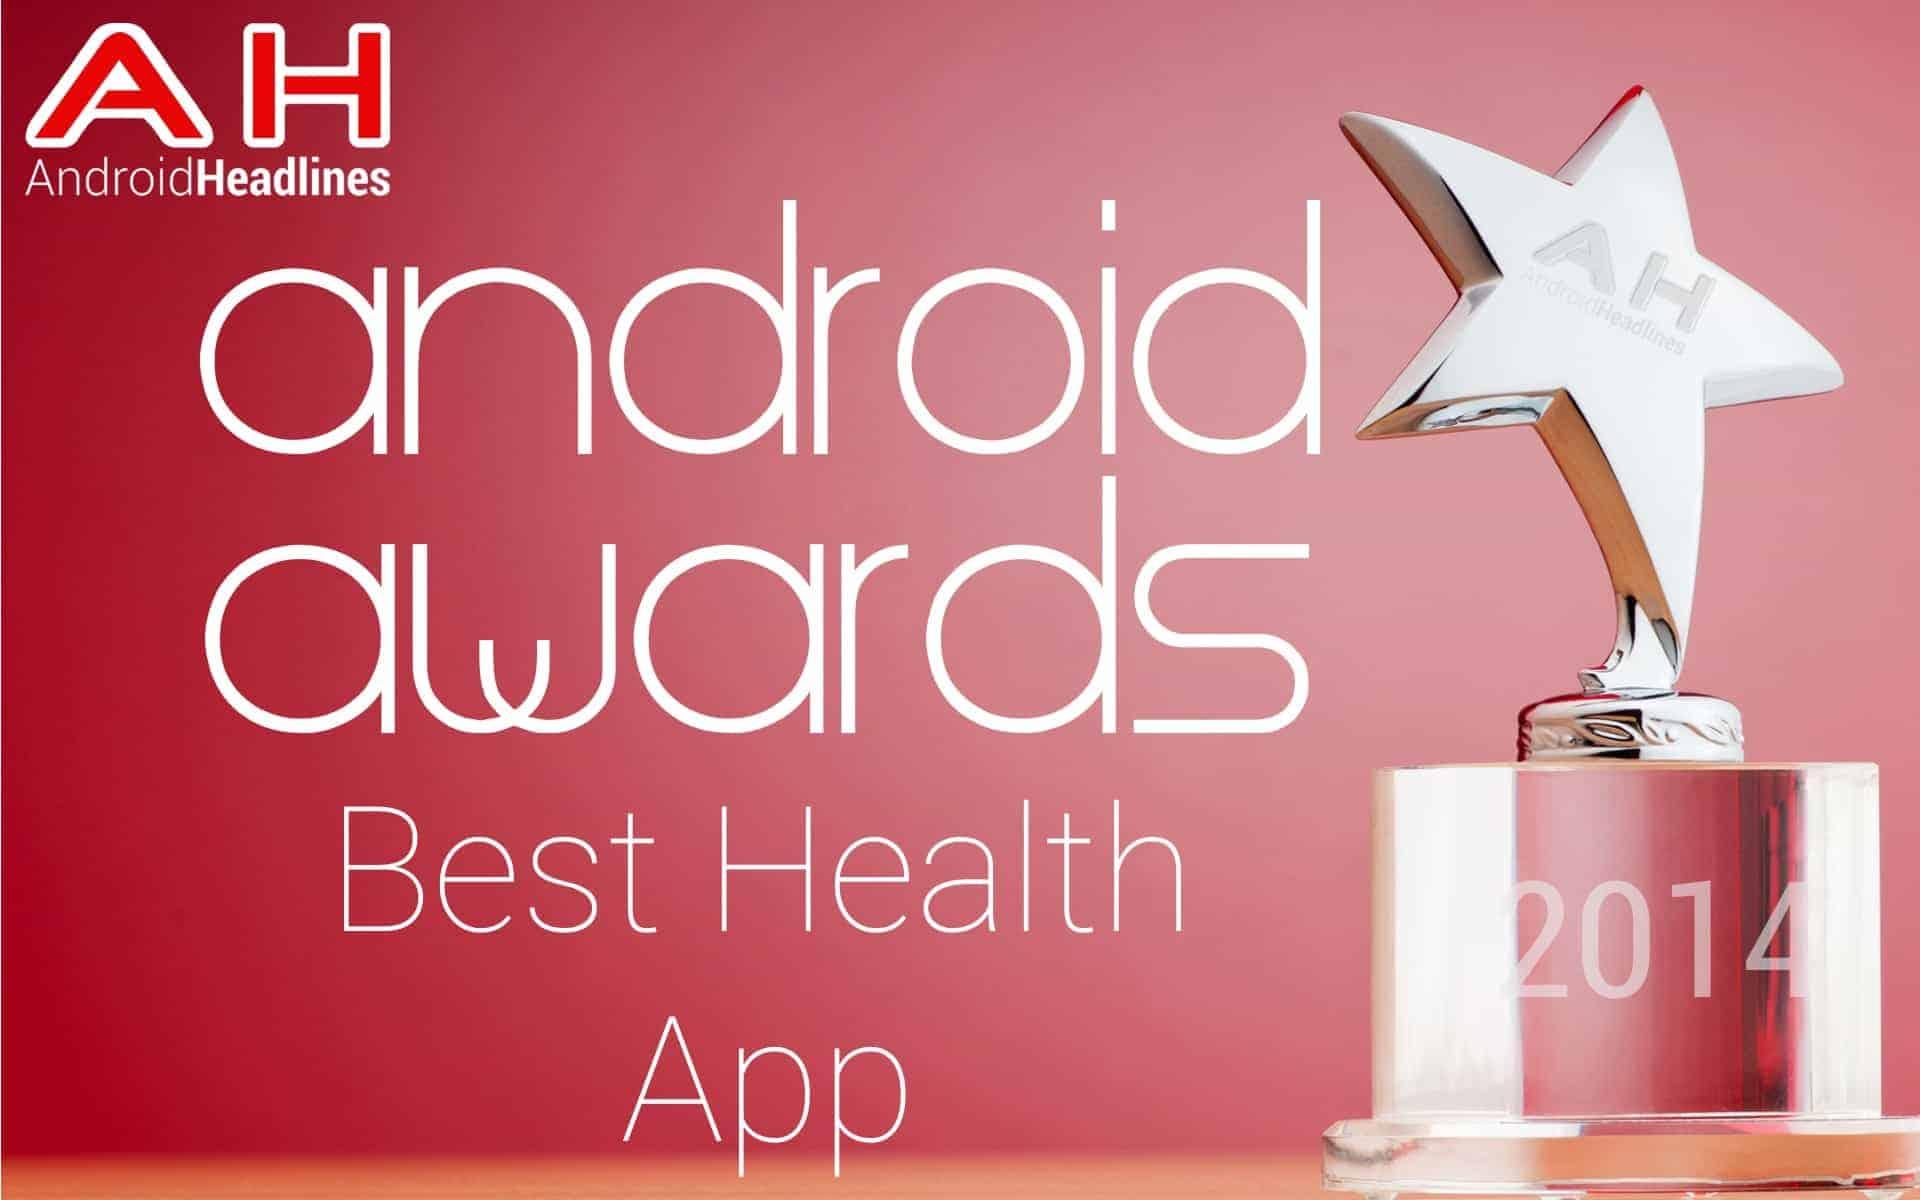 AH Awards 2015 Best Android Health App